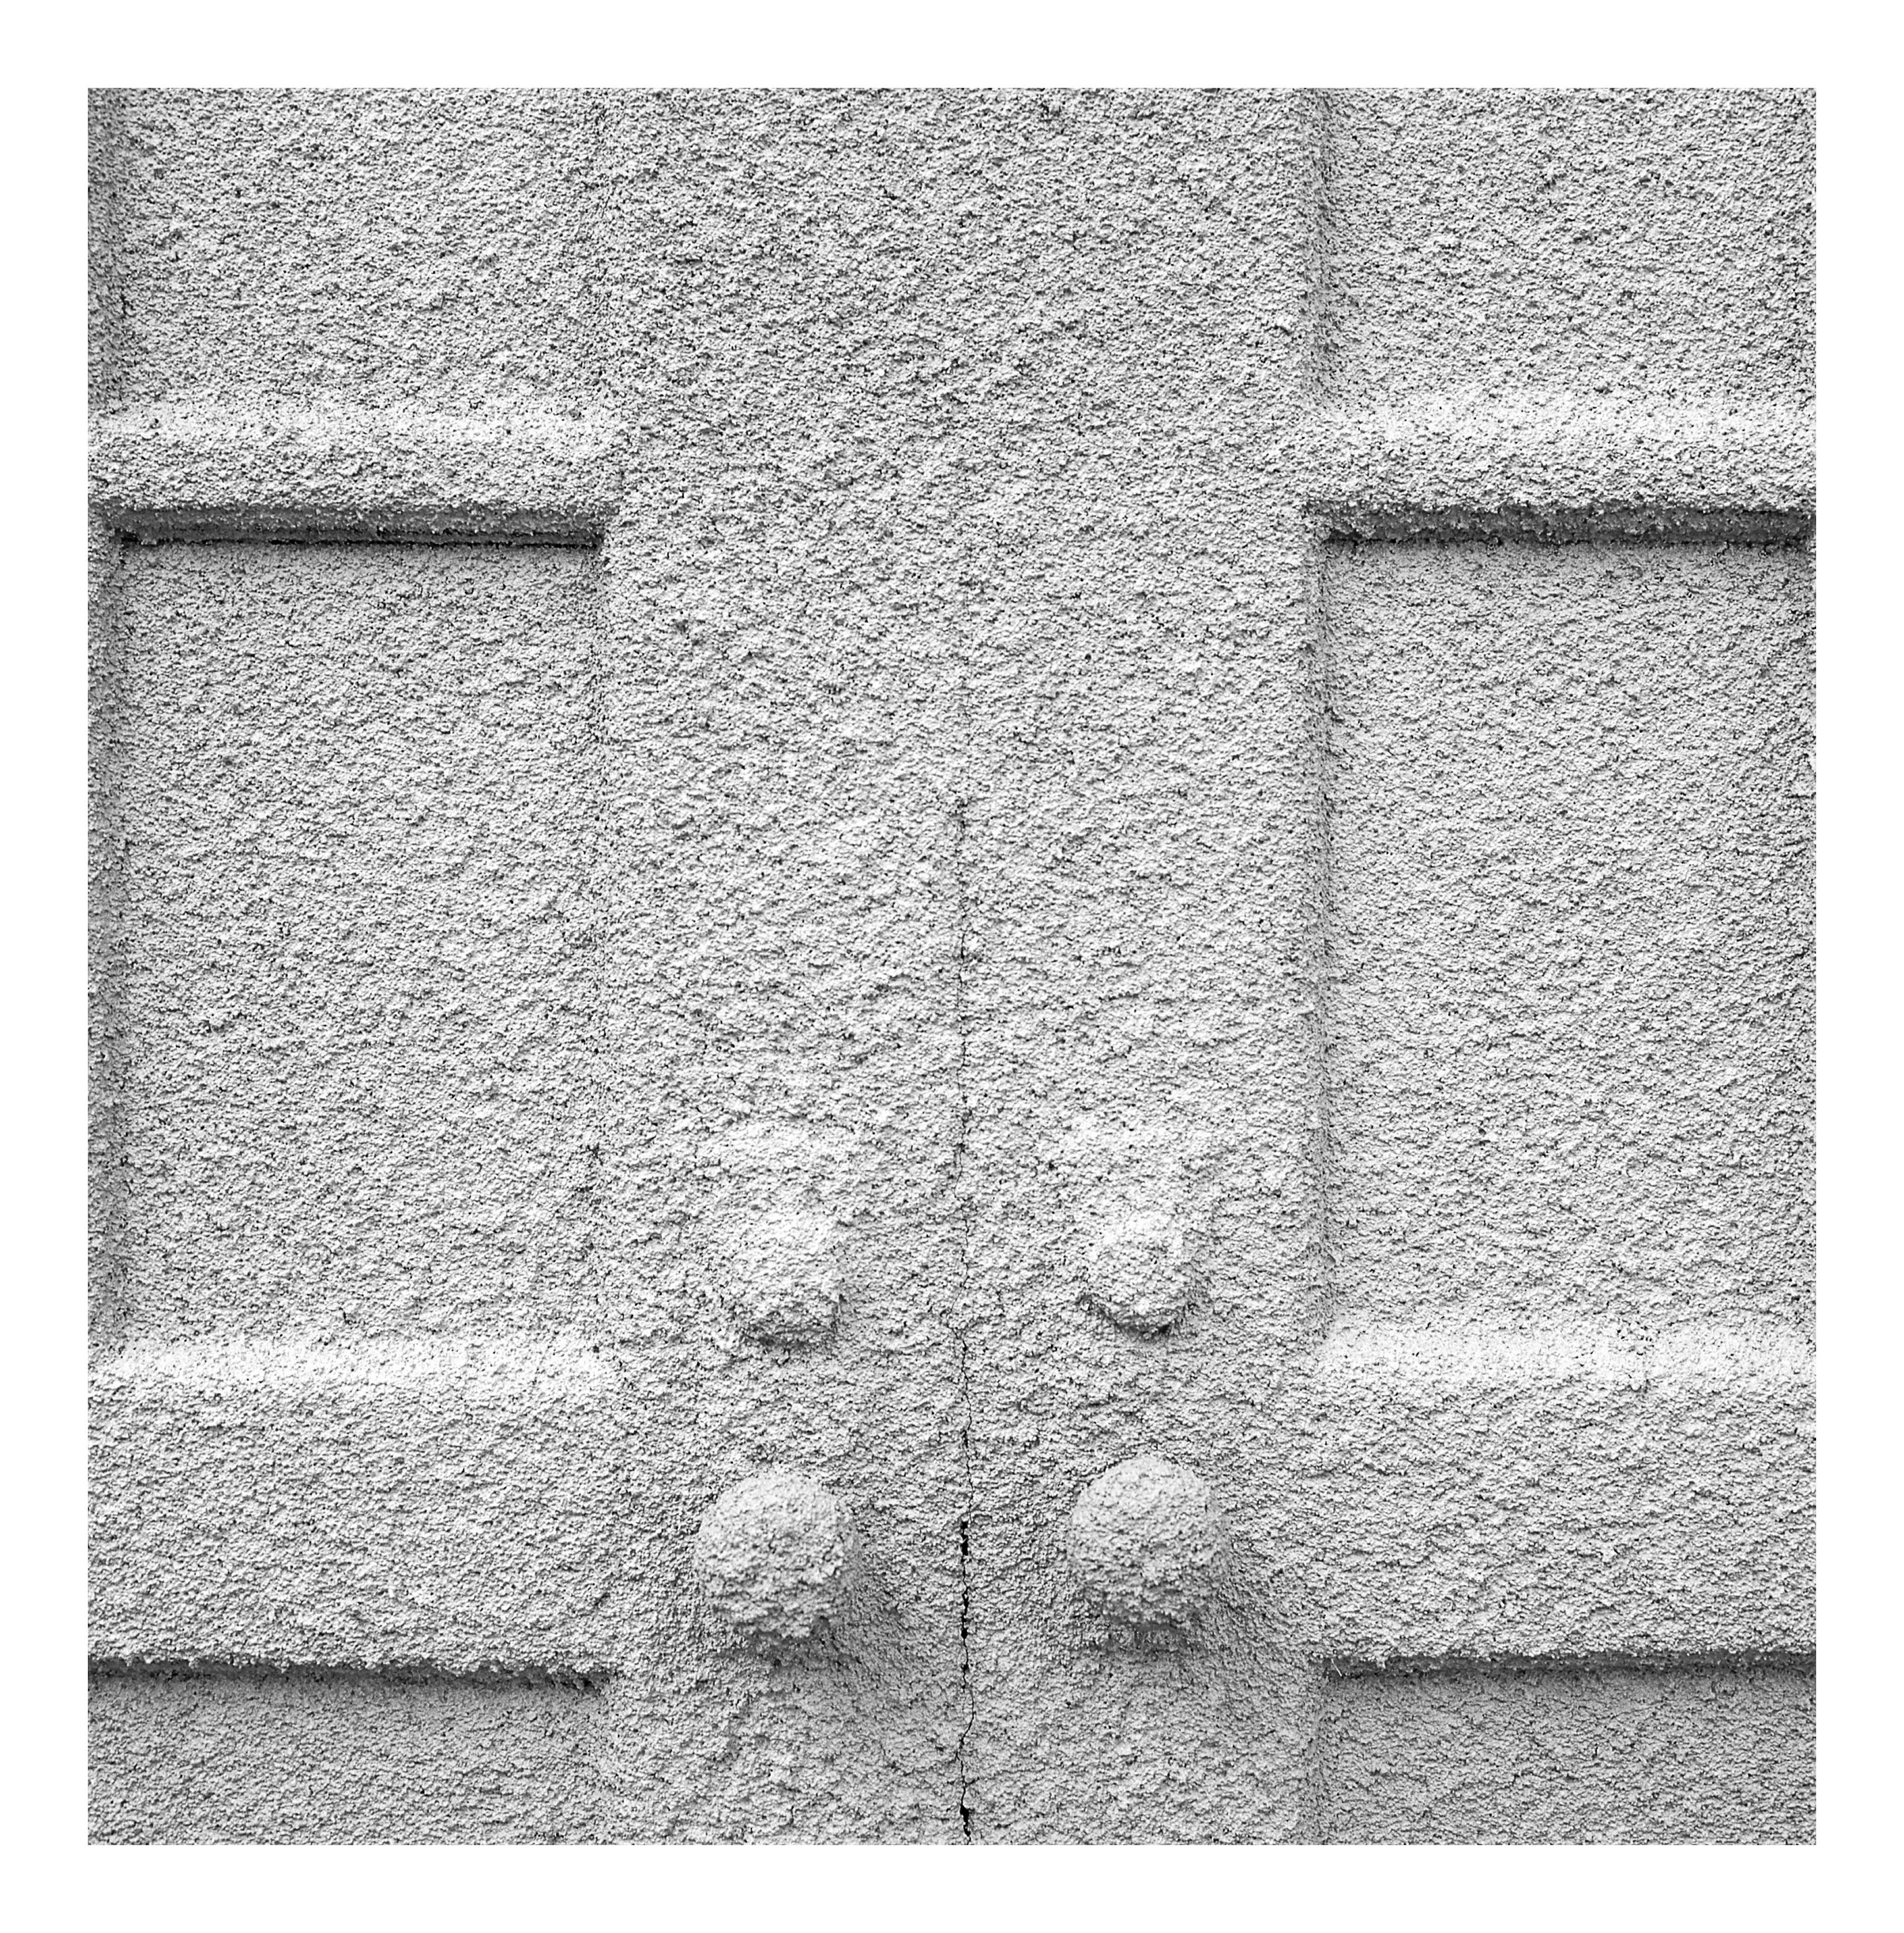 School Doors 2_surface detail